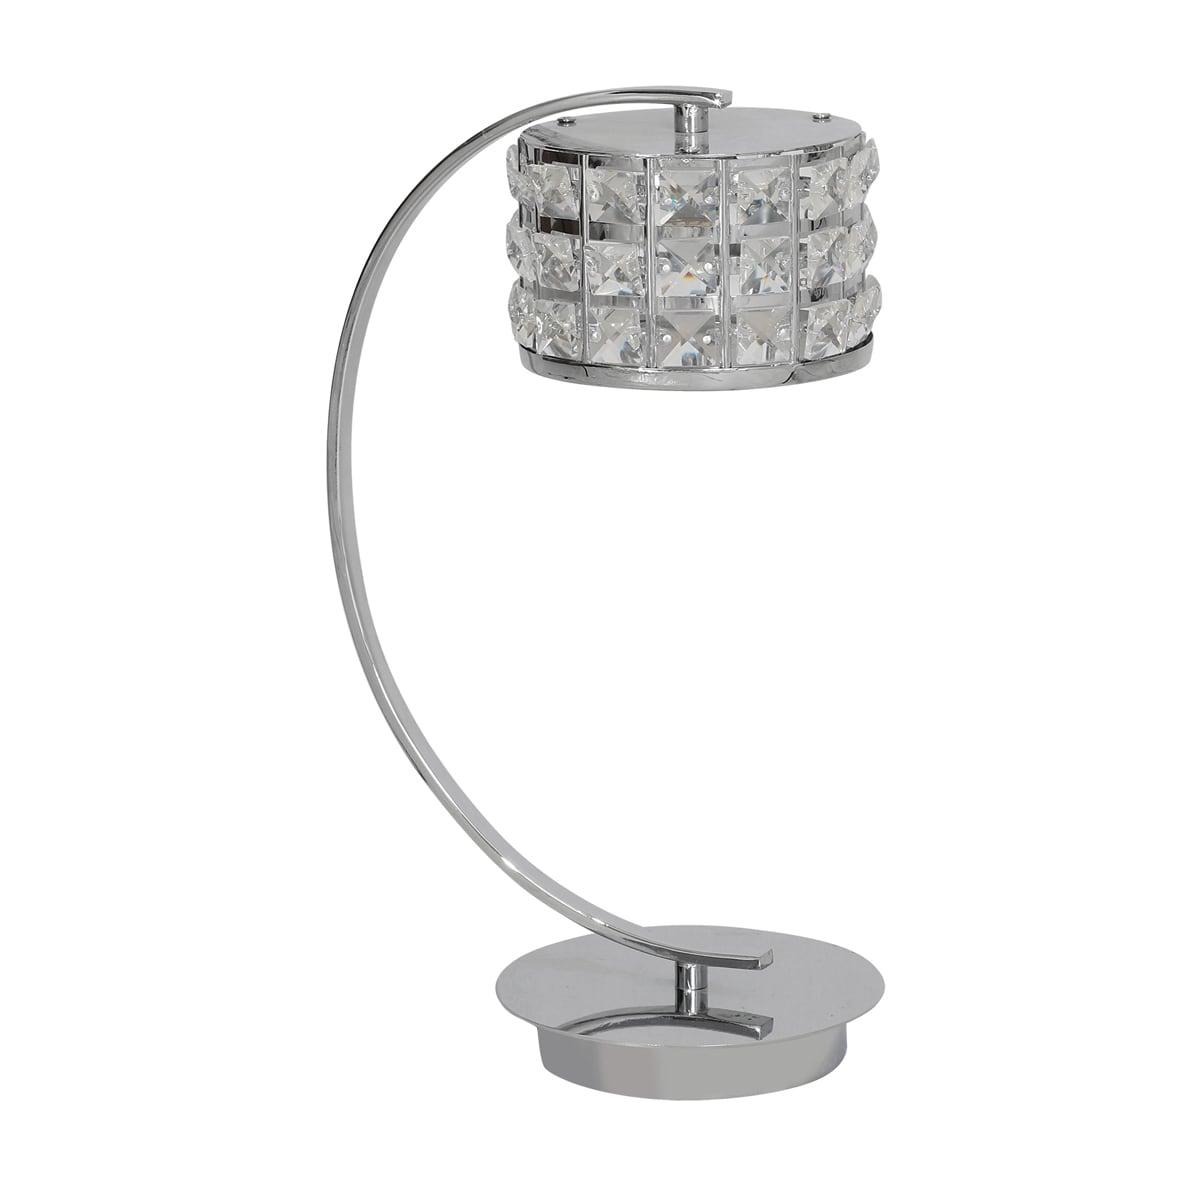 Milagro ALEX 173 Chrome 5W stolní lampa